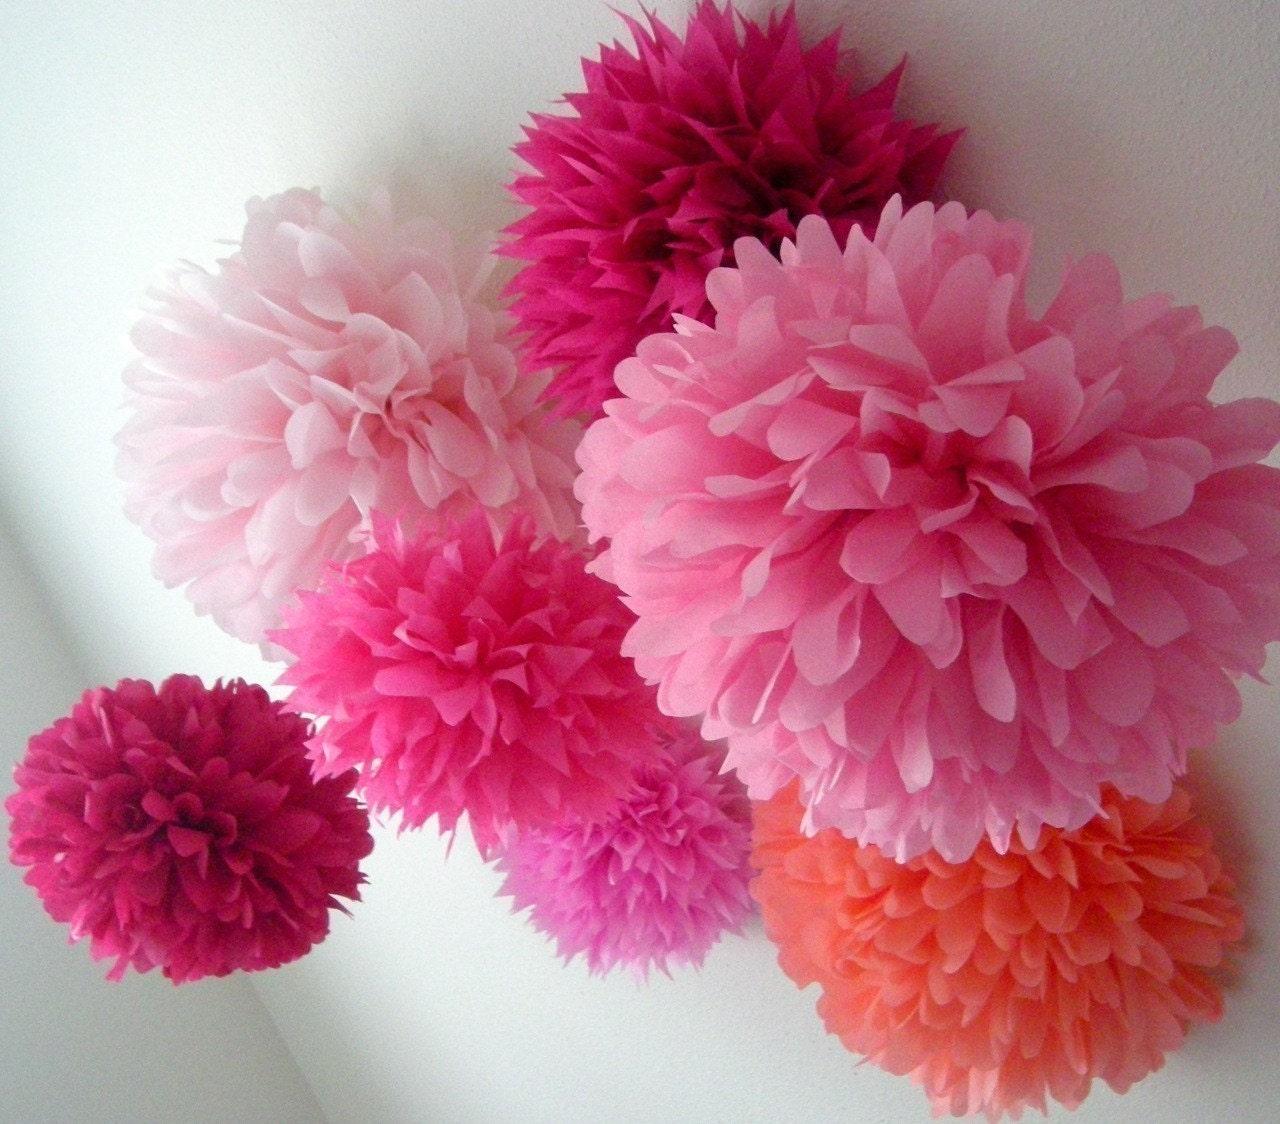 Pink, Indubitably ...10 tissue paper poms // diy kit // wedding // birthday // party decorations // pinkalicious // princess